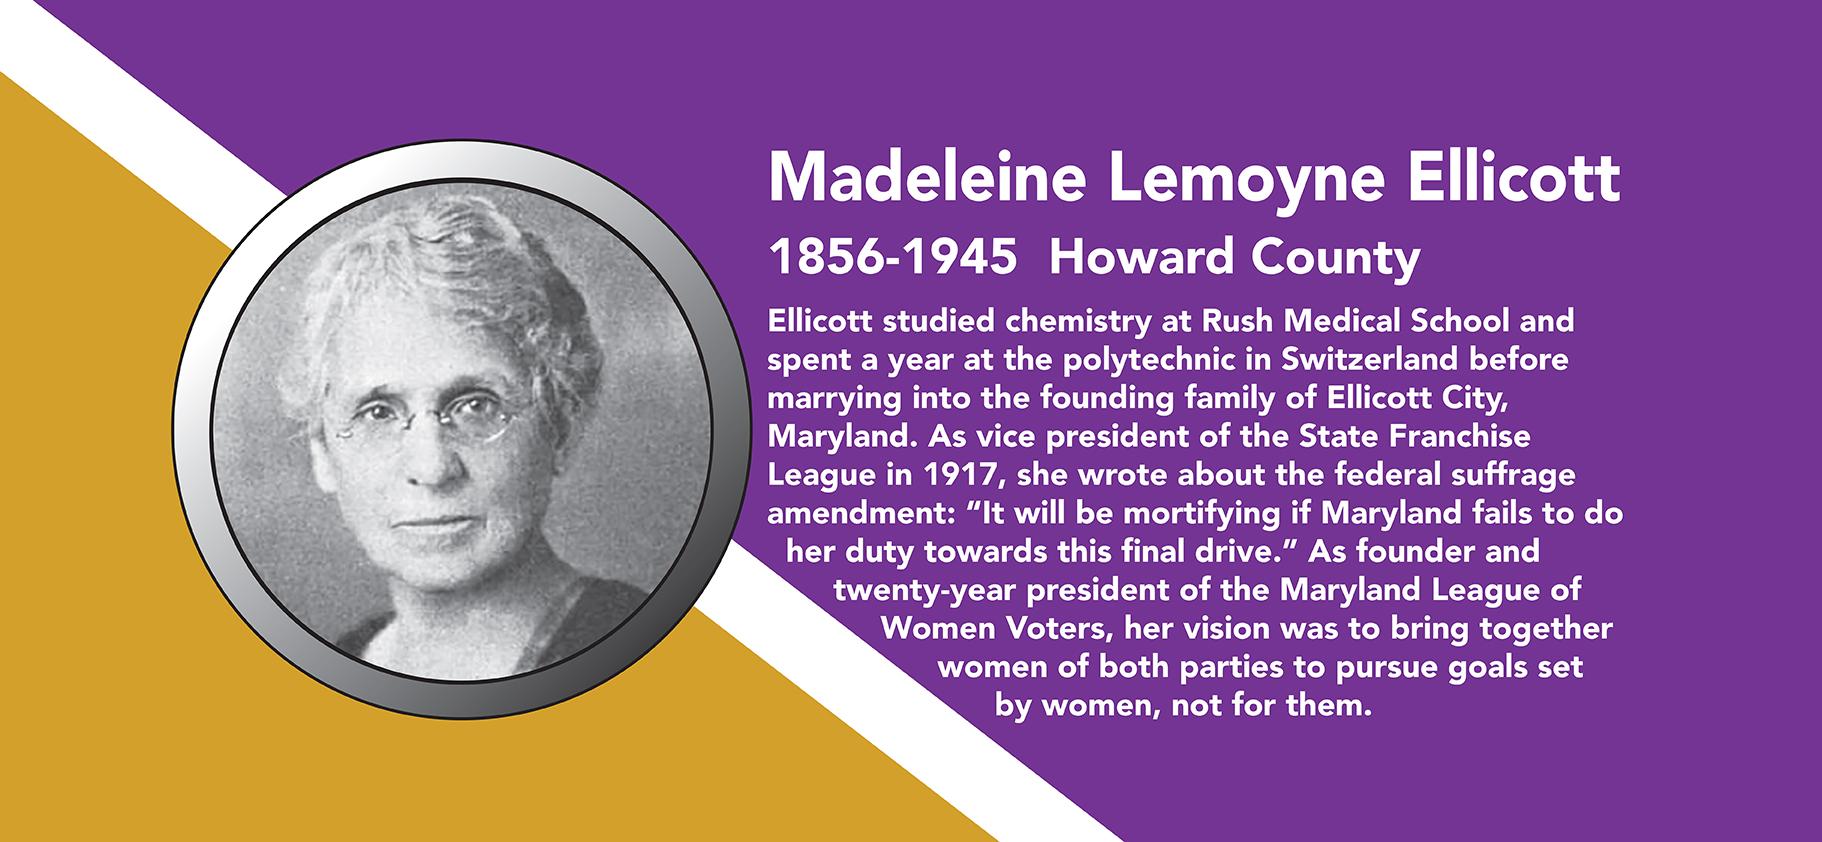 MadeleineLemoyneEllicott